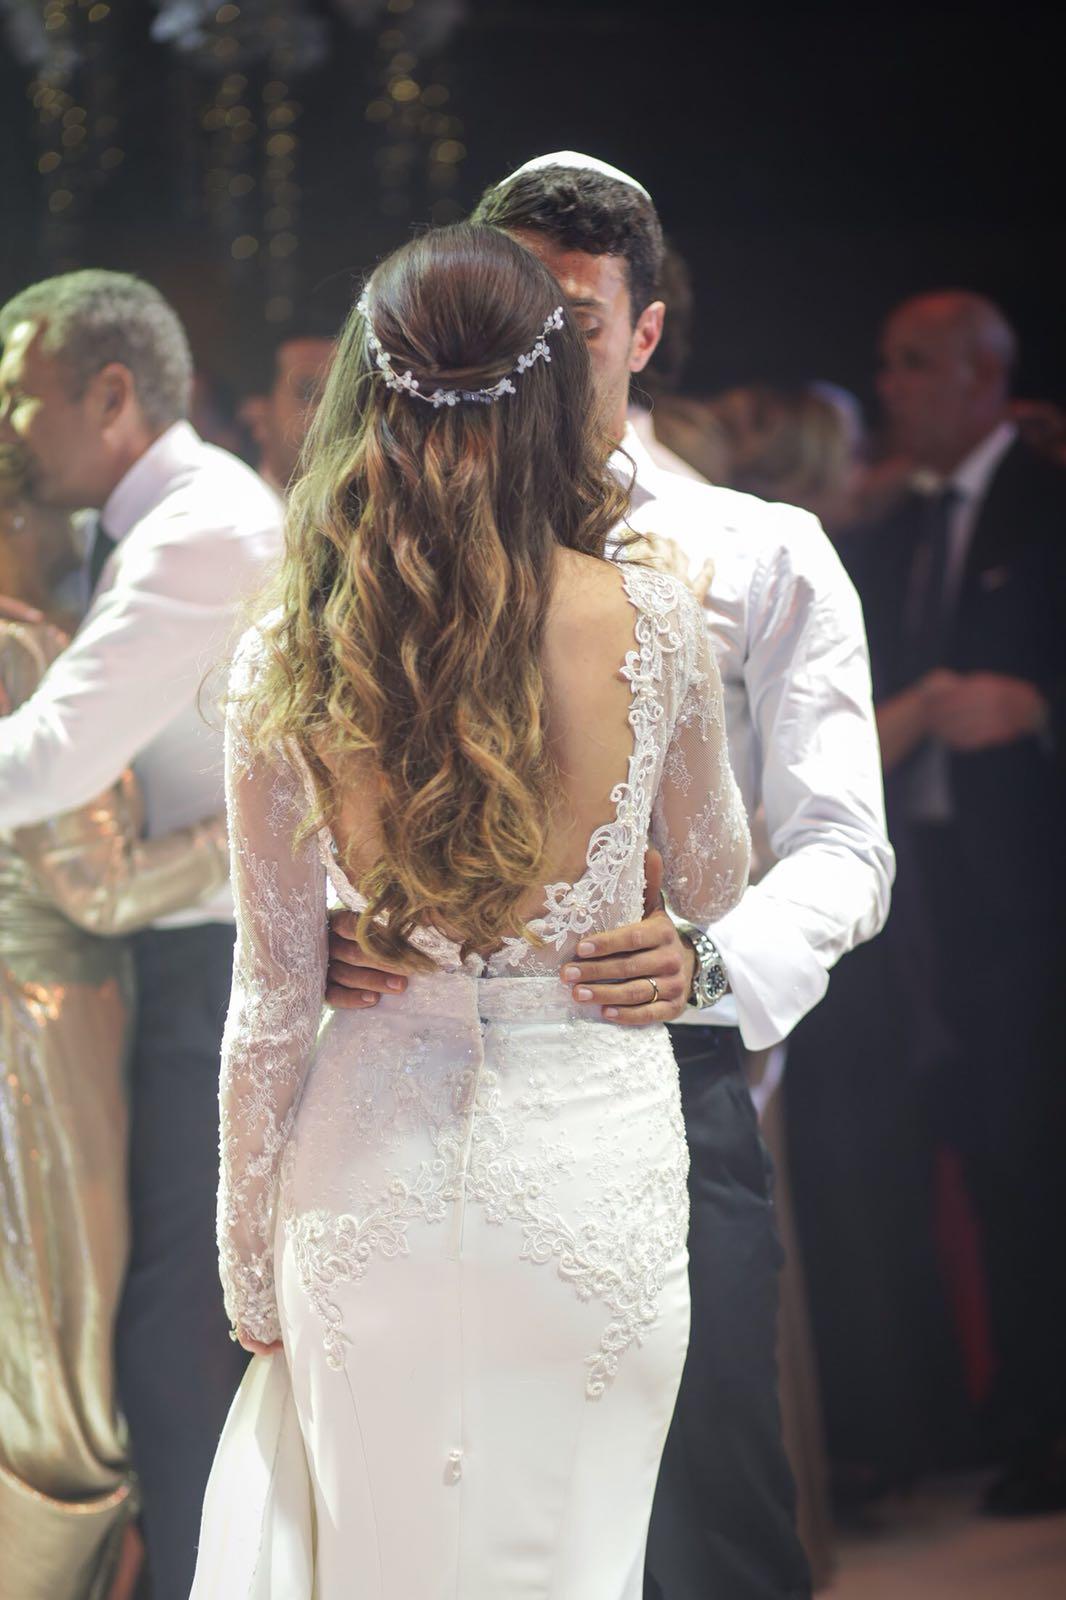 alessia-solidani-blog-matrimonio-tel-aviv 22